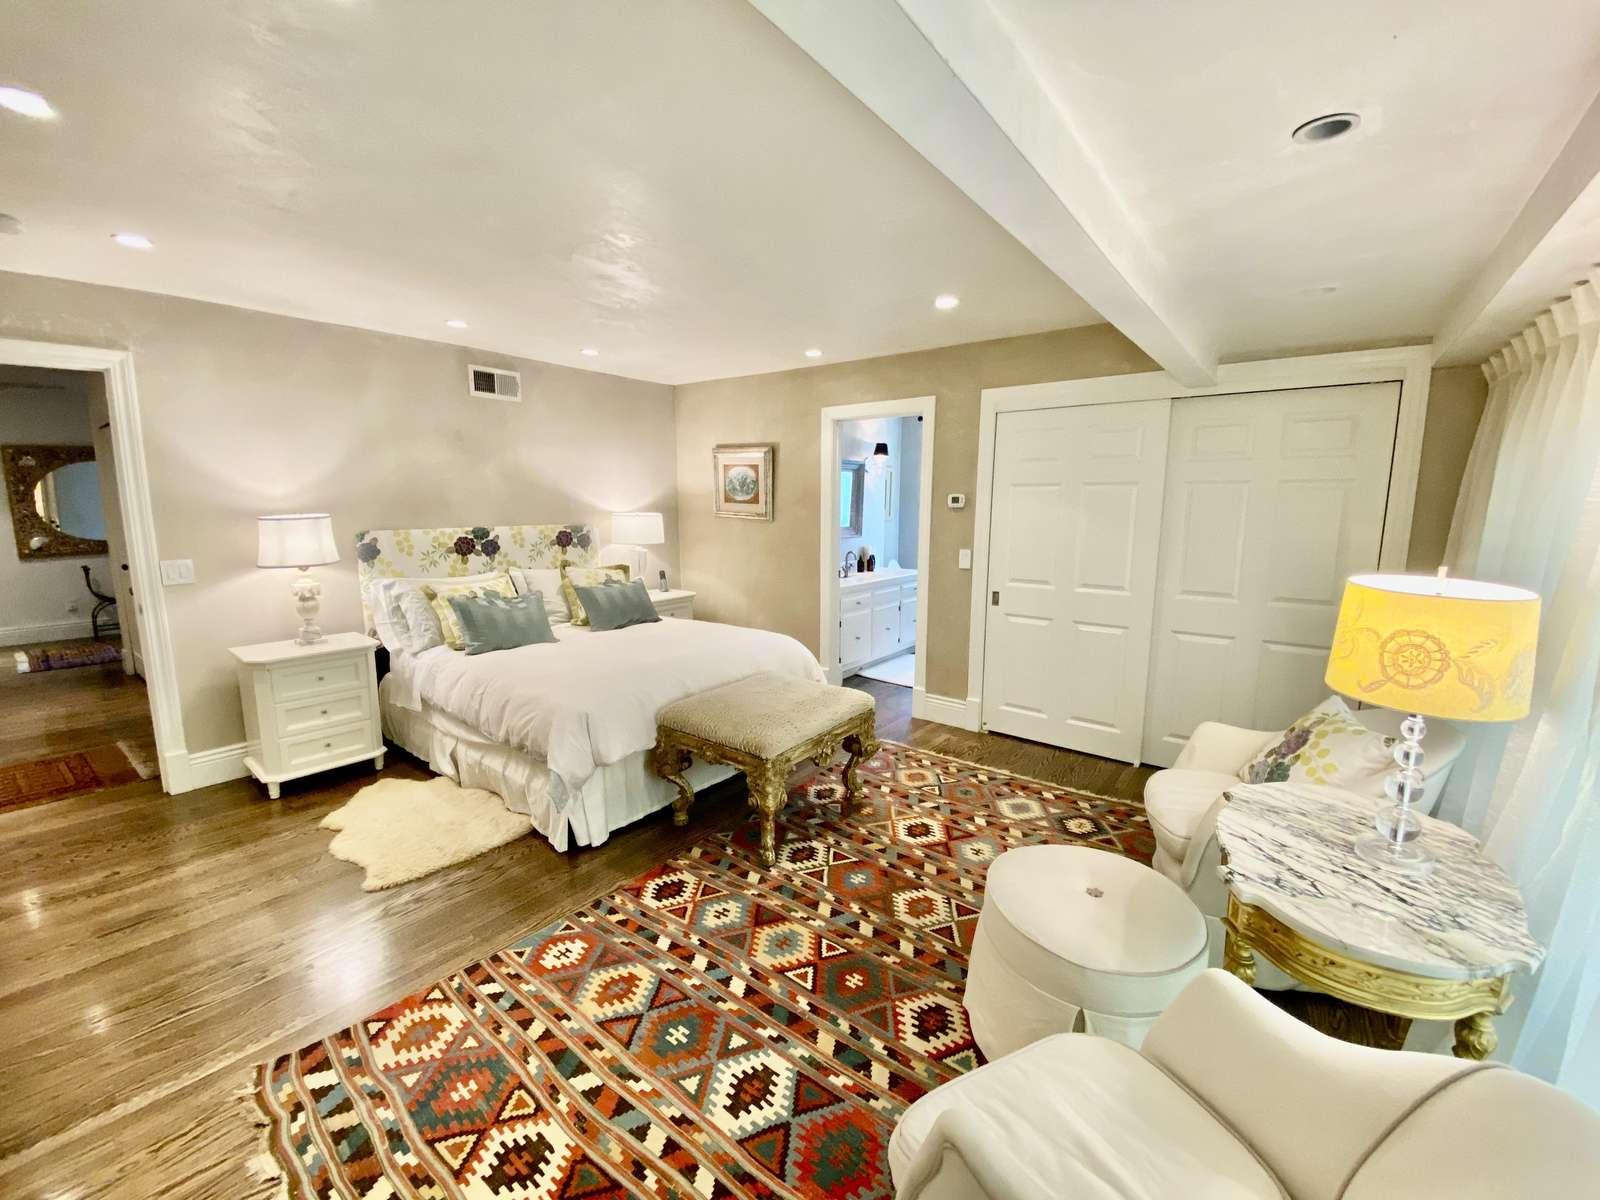 Master bedroom 4 (queen) with ensuite full bath